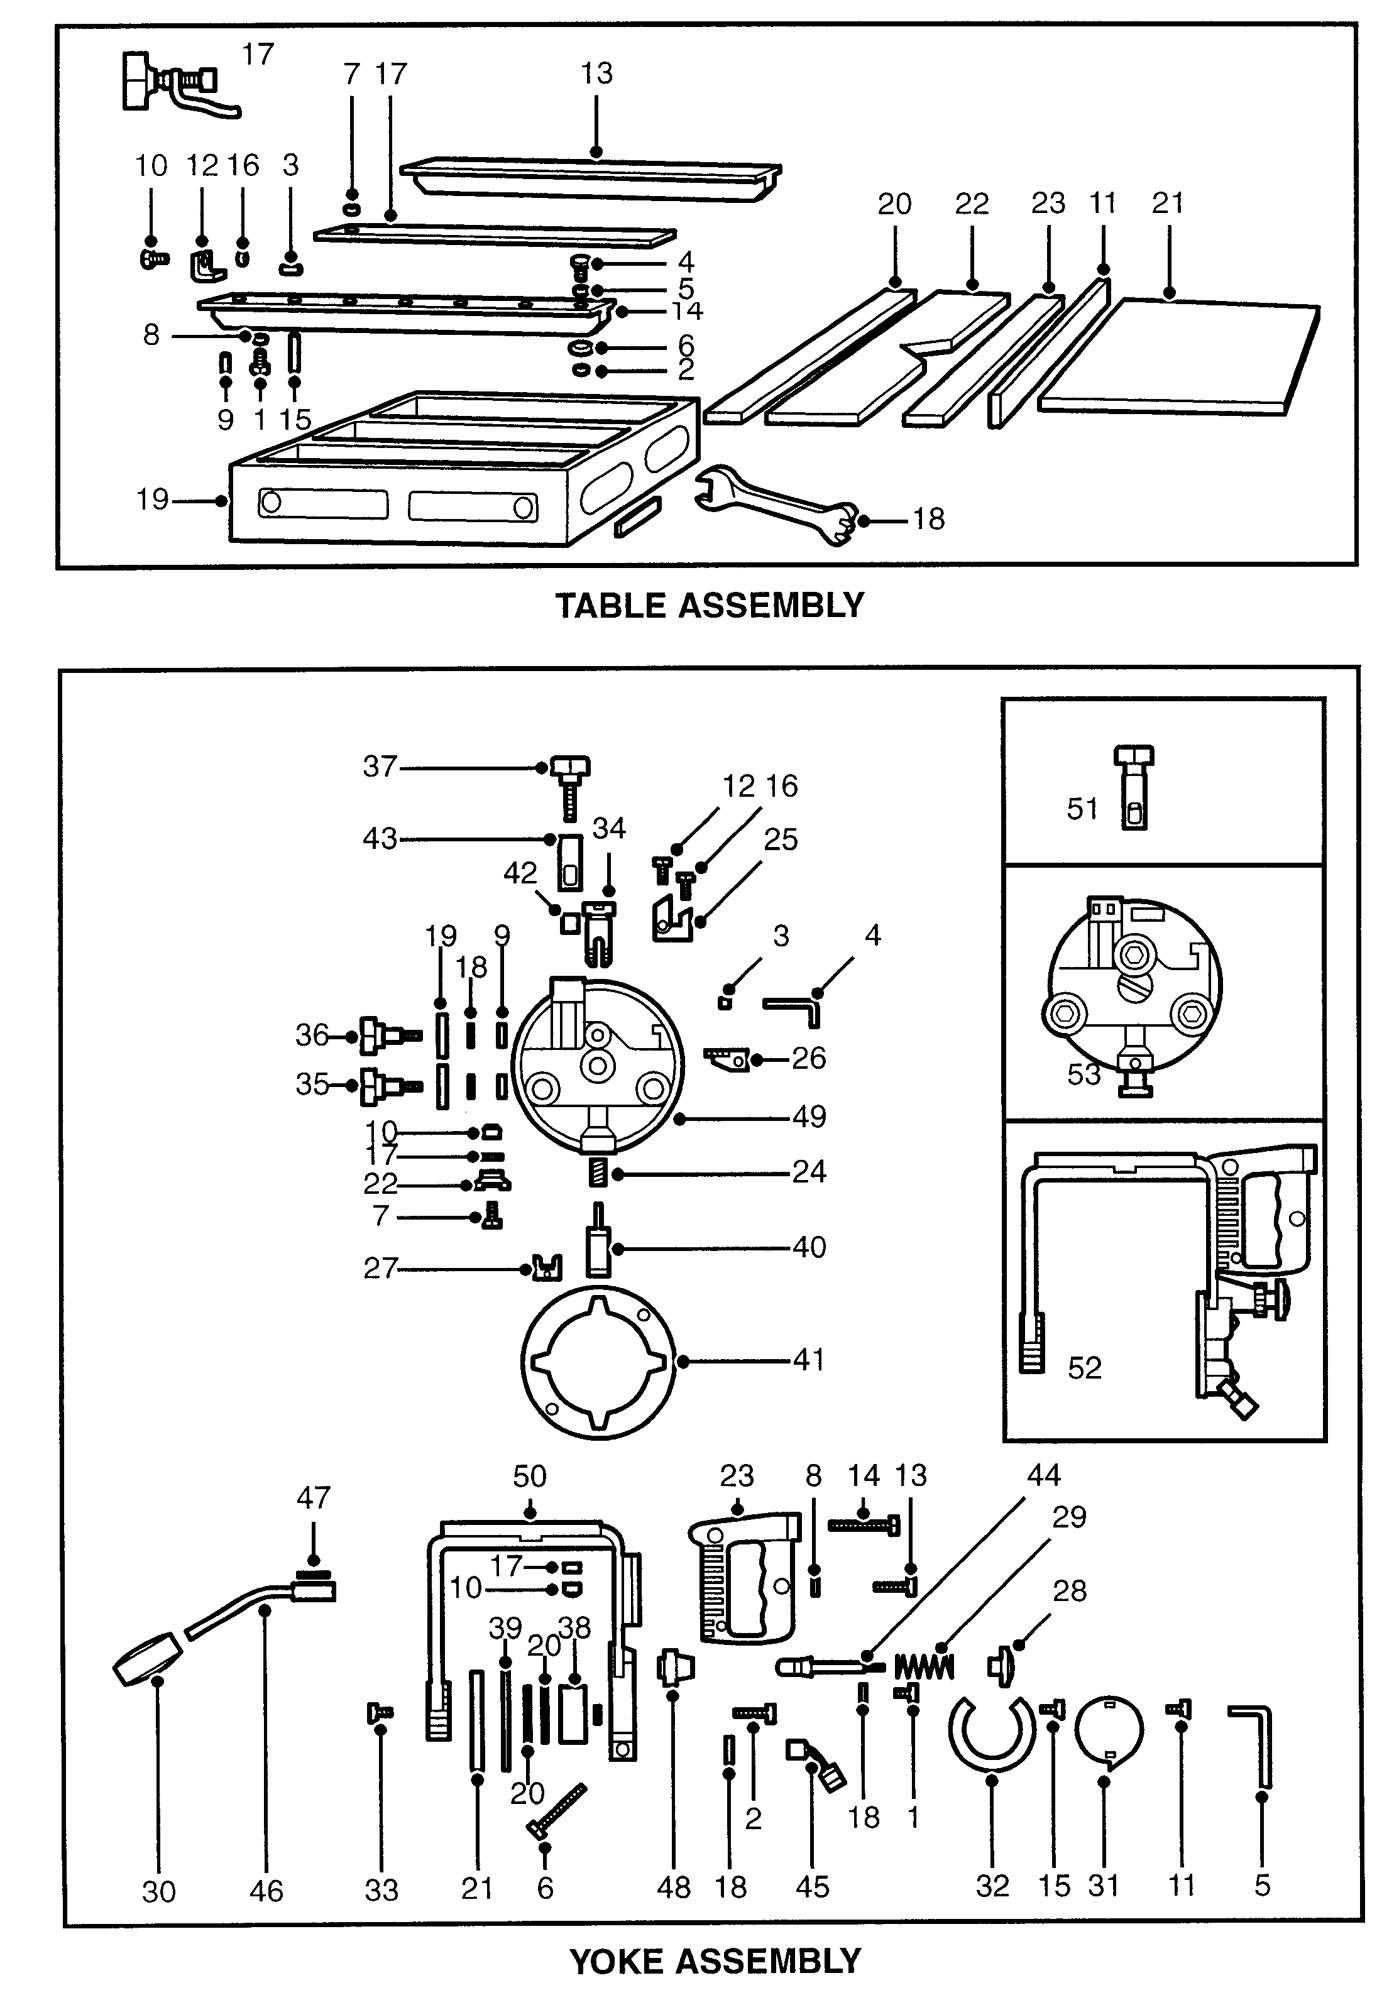 spares for dewalt dw125 b radial arm saw  type 1 De Walt Radial Arm Saw Accessories dewalt 770 radial arm saw parts list